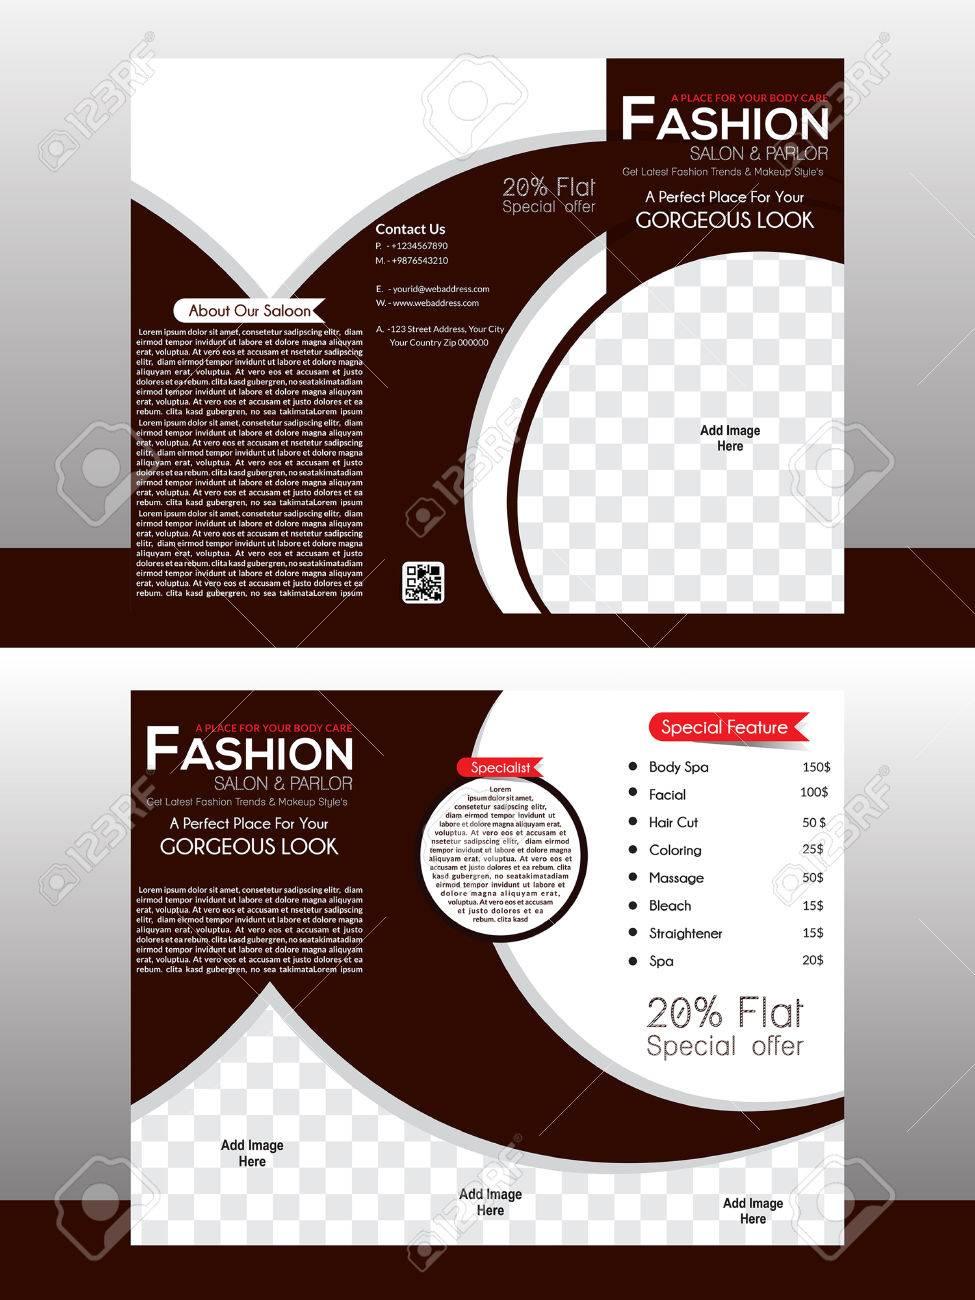 tri fold fashion brochure template design illustration stock vector 58806722 - Fashion Brochure Template